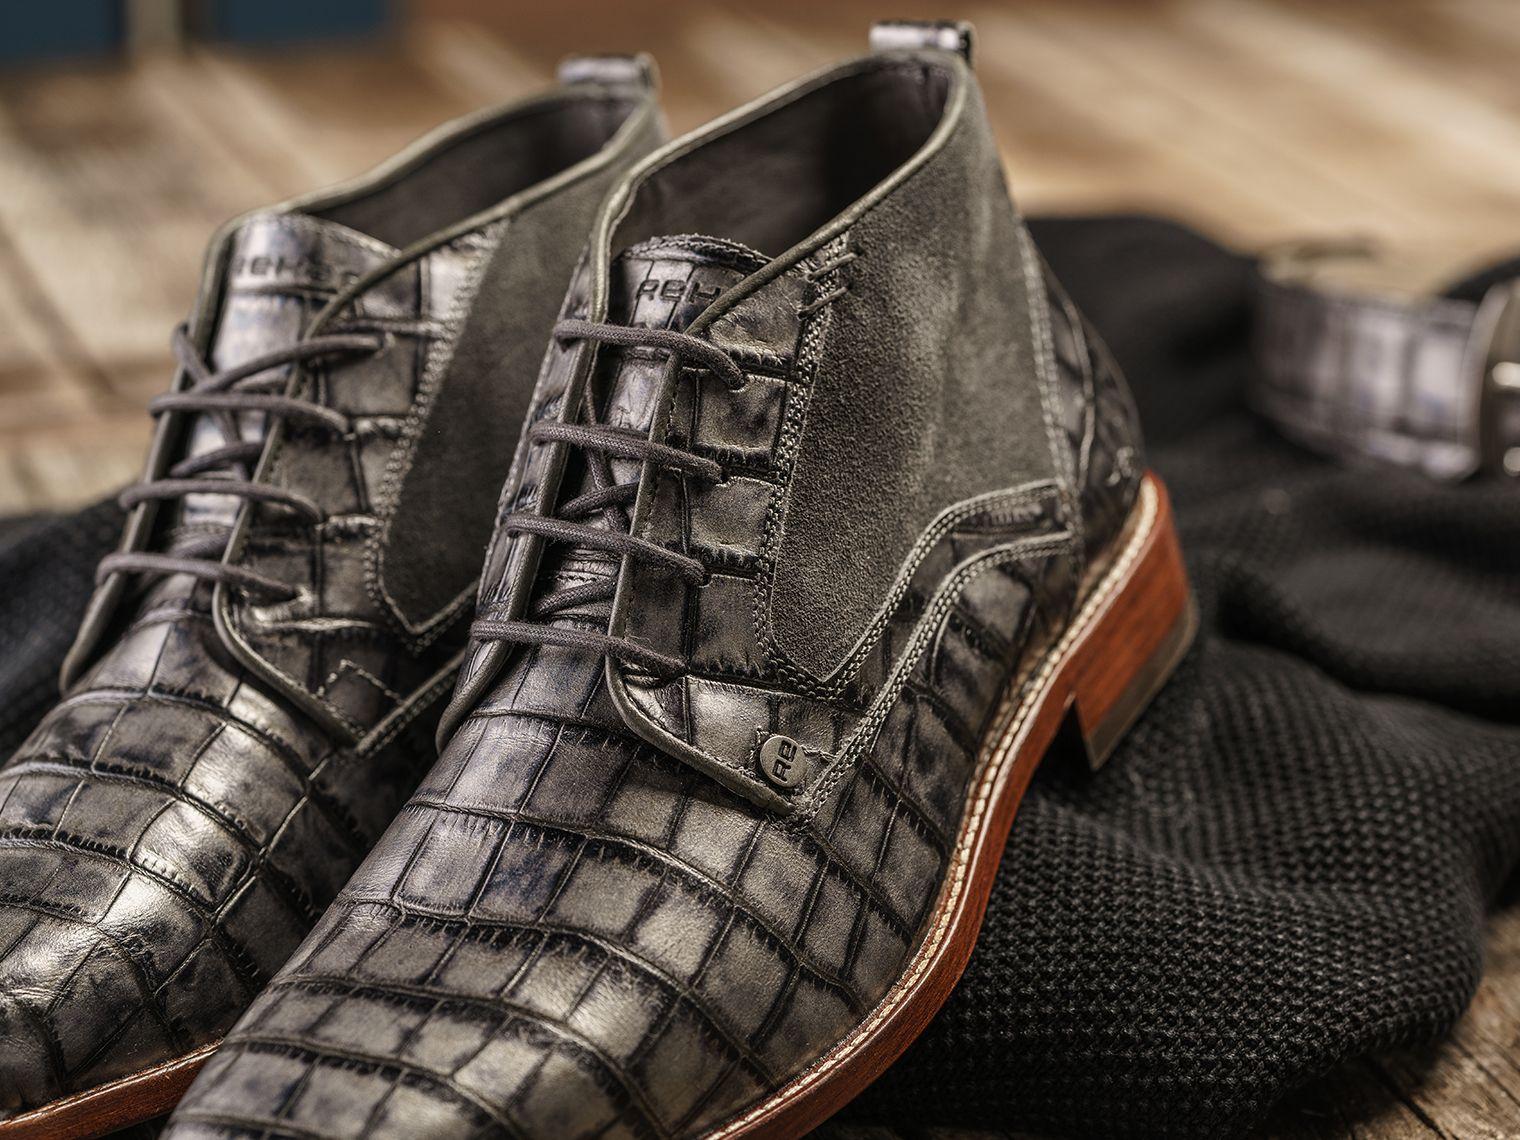 REHAB Lennox Croco Dust #rehabfootwear #classiccollection #lennox #crocoprint #suede #statement #uniquelook #trendy